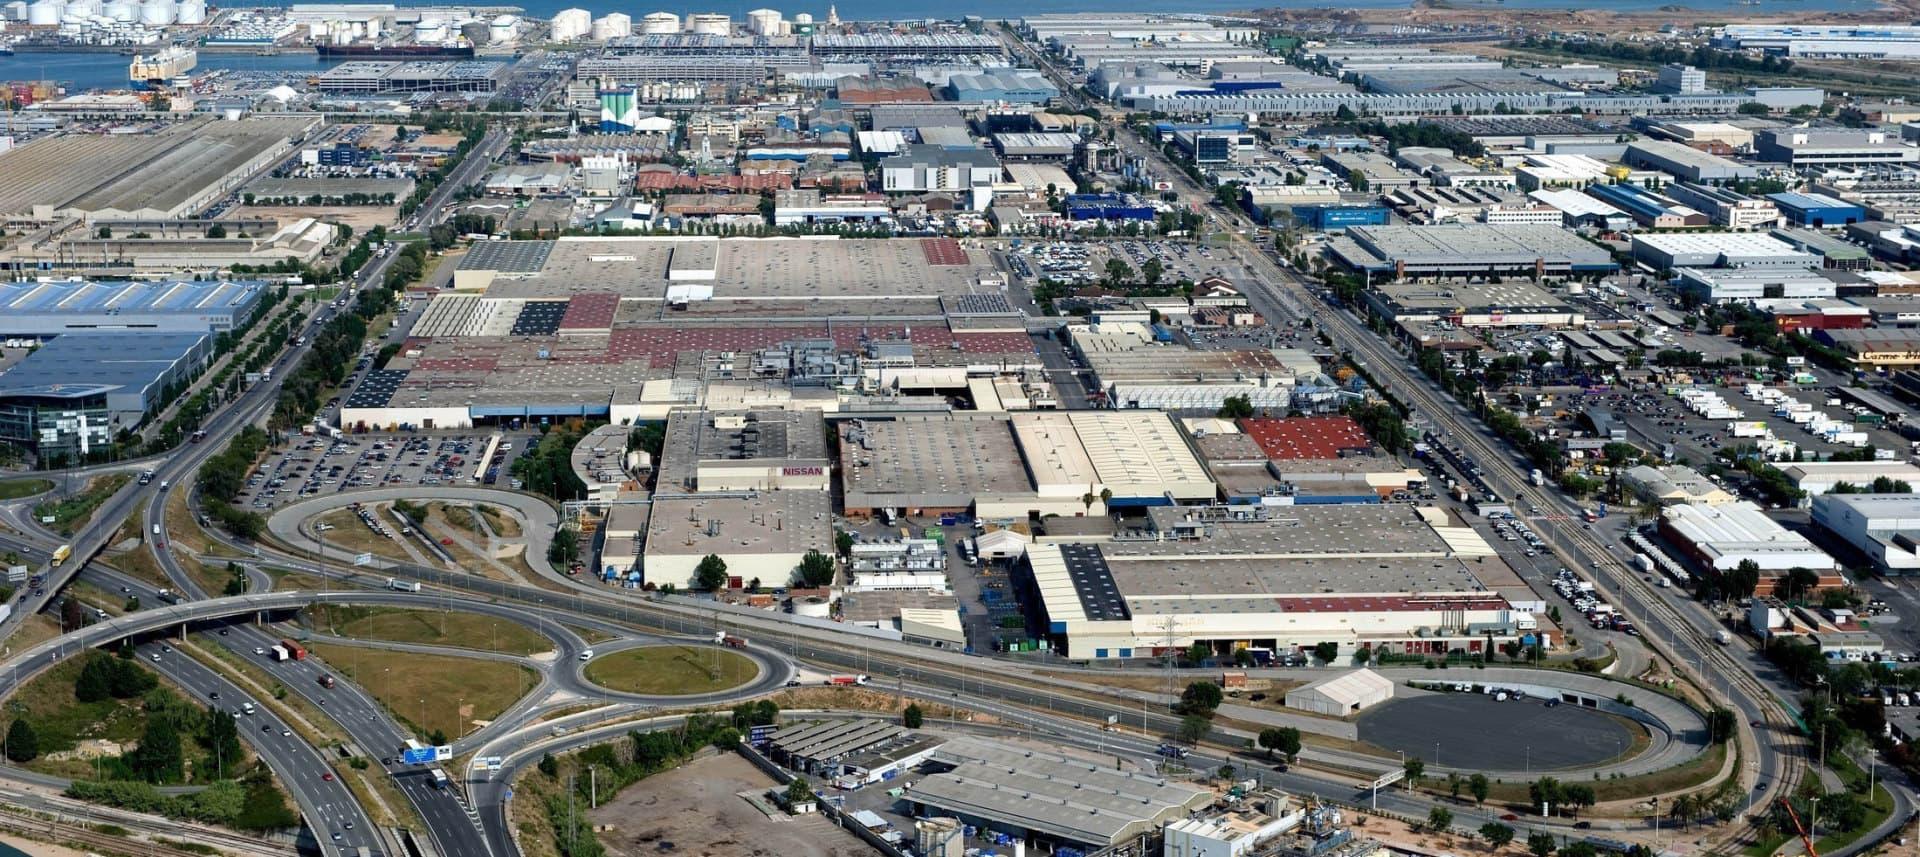 Nissan Fabrica Zona Franca Vista Aerea